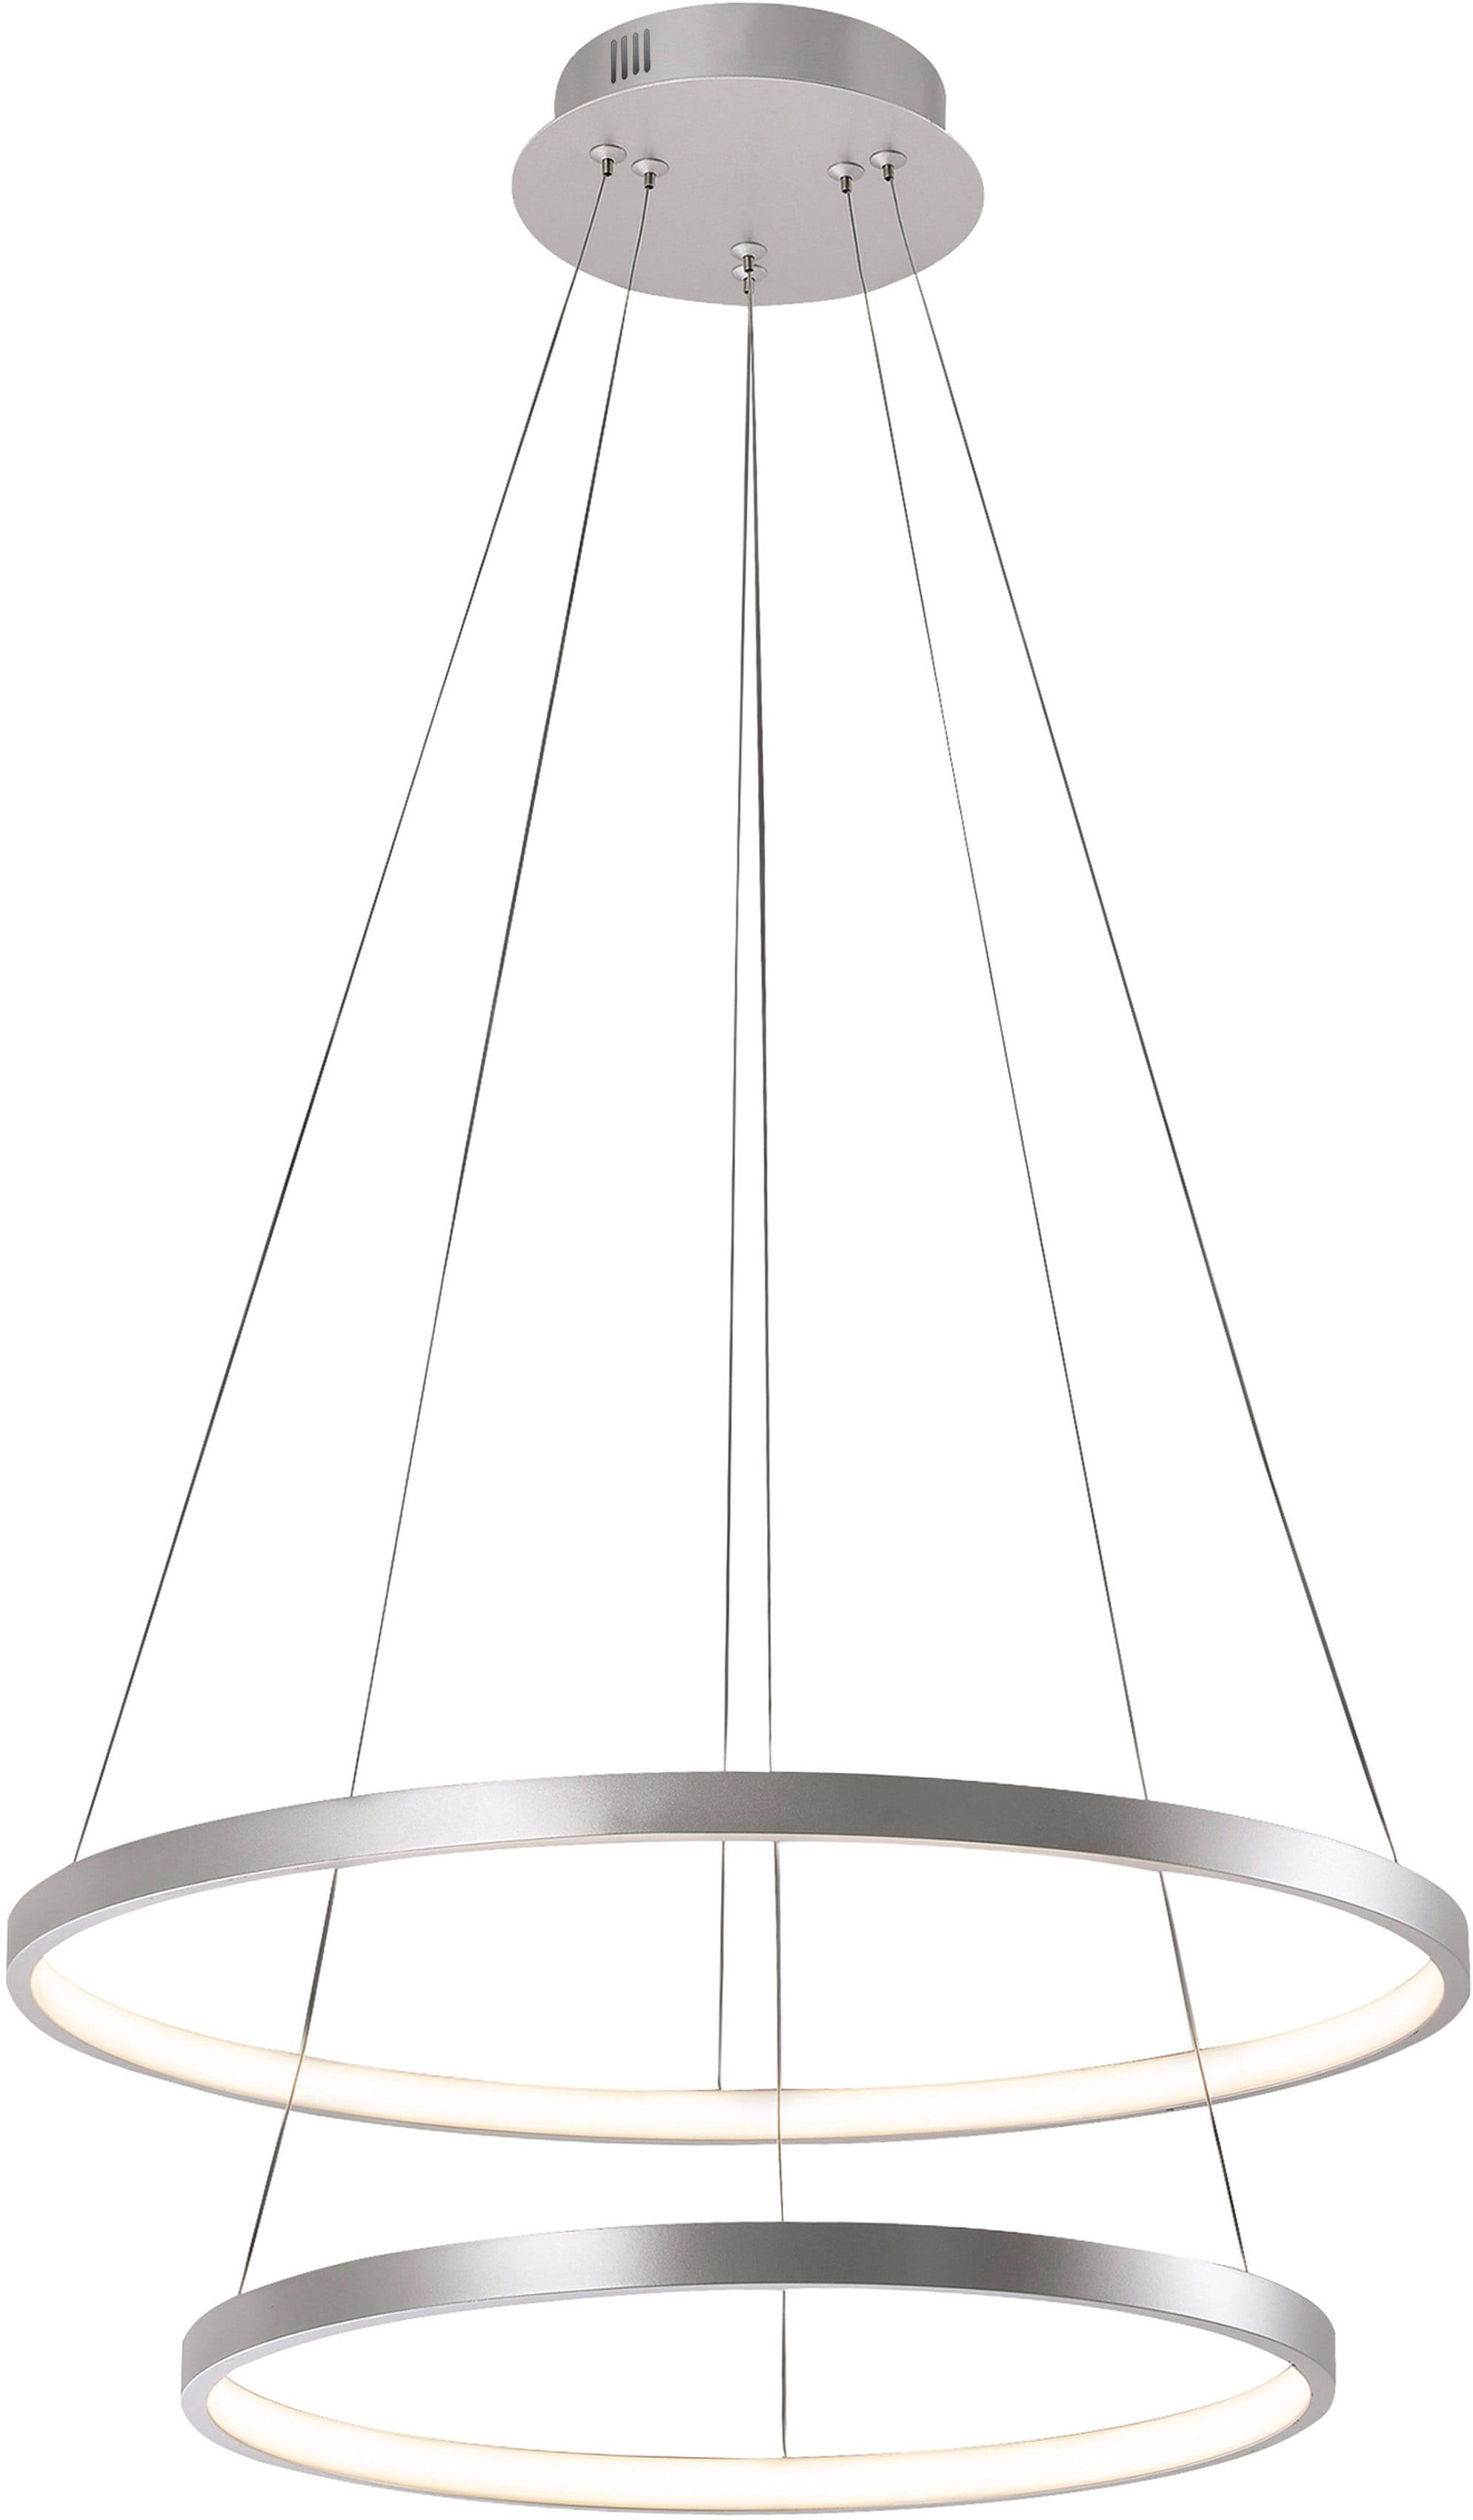 Leuchten Direkt,LED Pendelleuchte CIRCLE